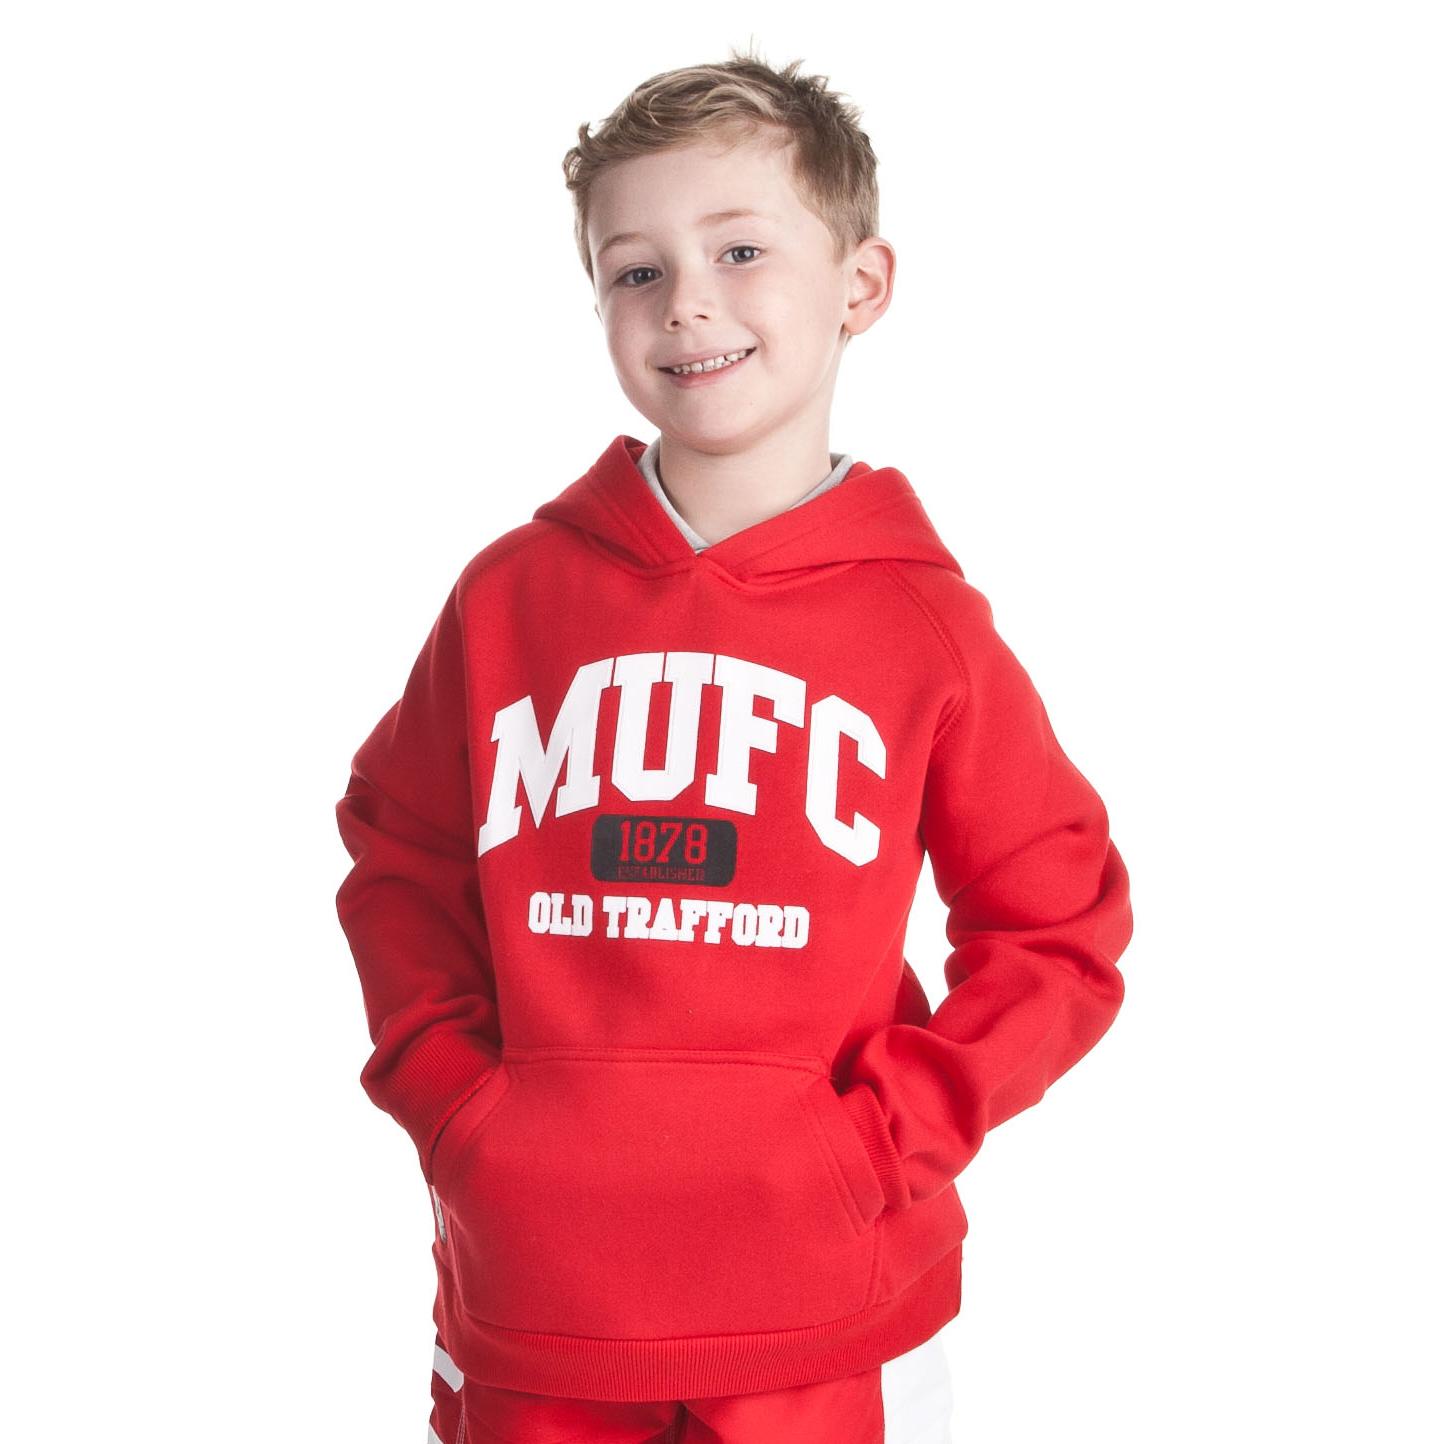 Manchester United 1878 Hoody - OT Red - Older Boys